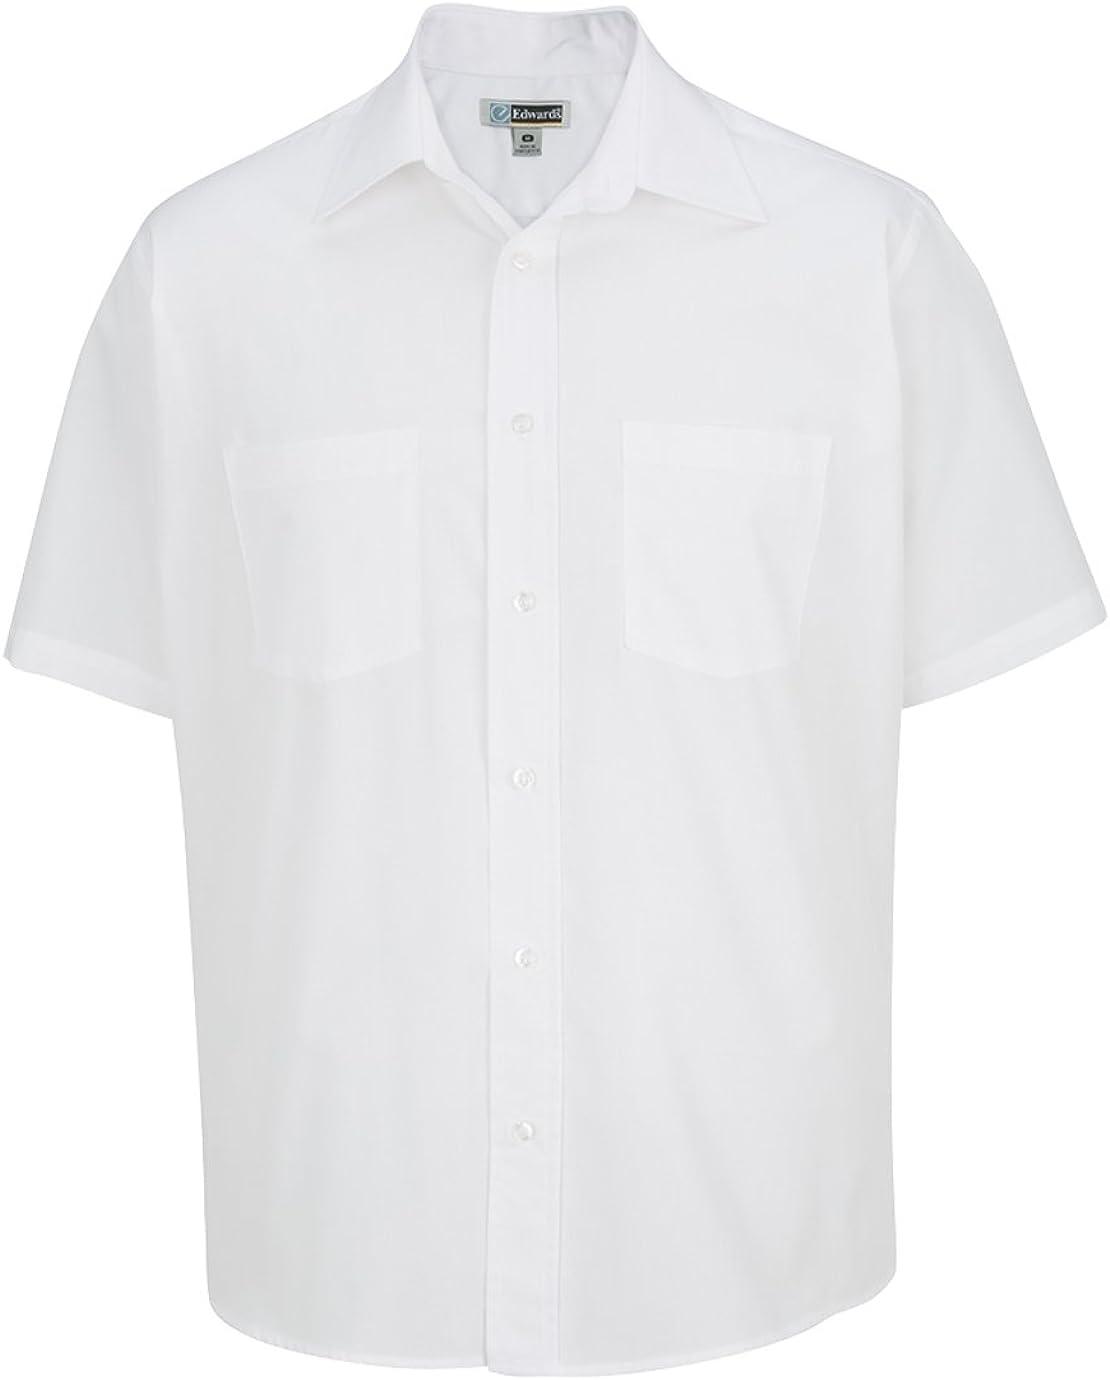 Edwards Men'S 2-Pocket Broadcloth Short Sleeve Shirt White L